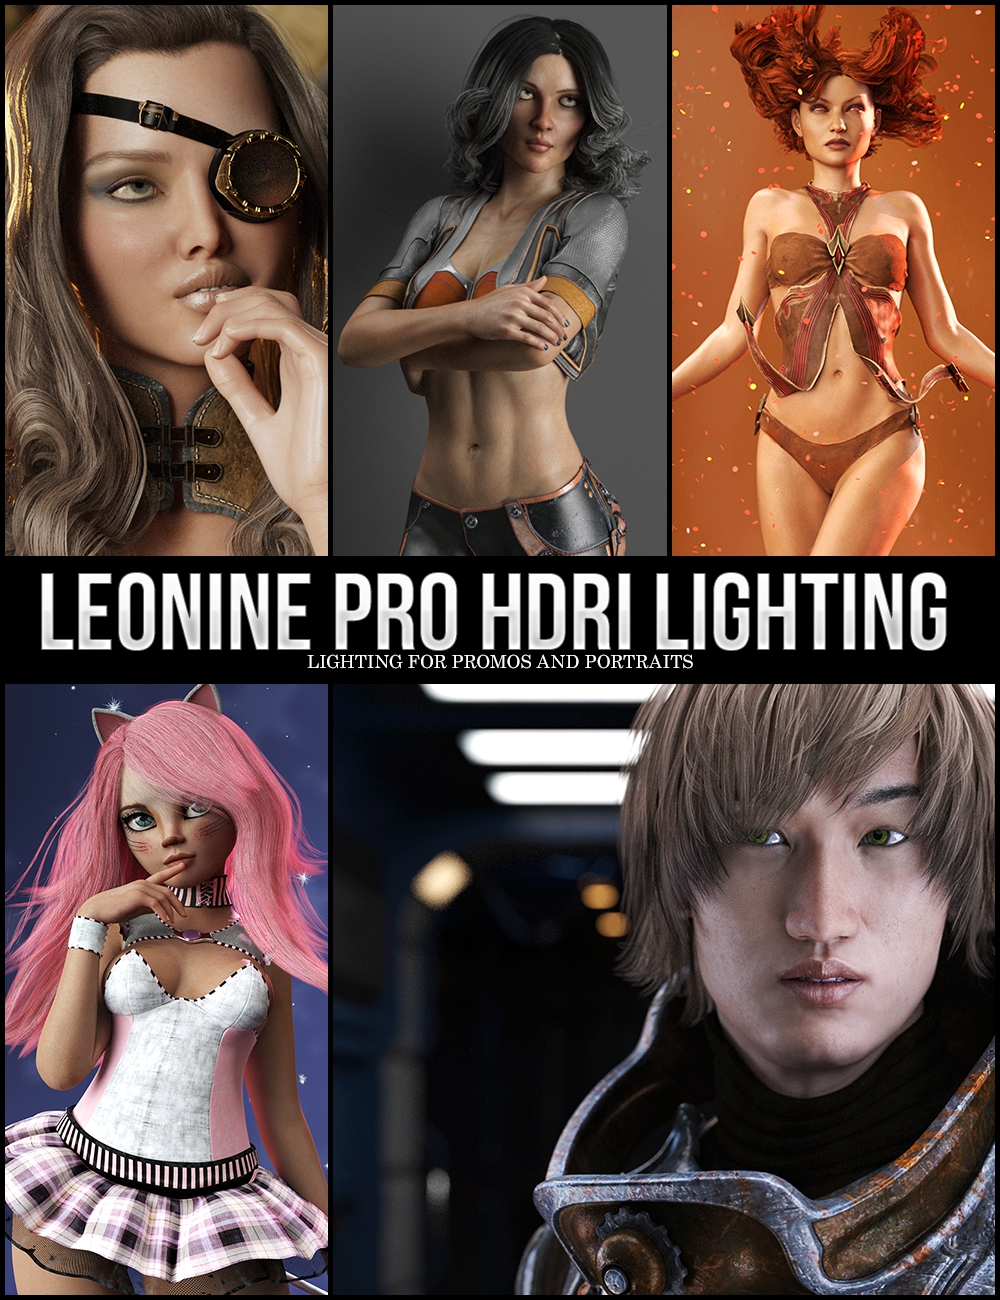 LY Leonine Pro HDR Lighting by: Lyoness, 3D Models by Daz 3D